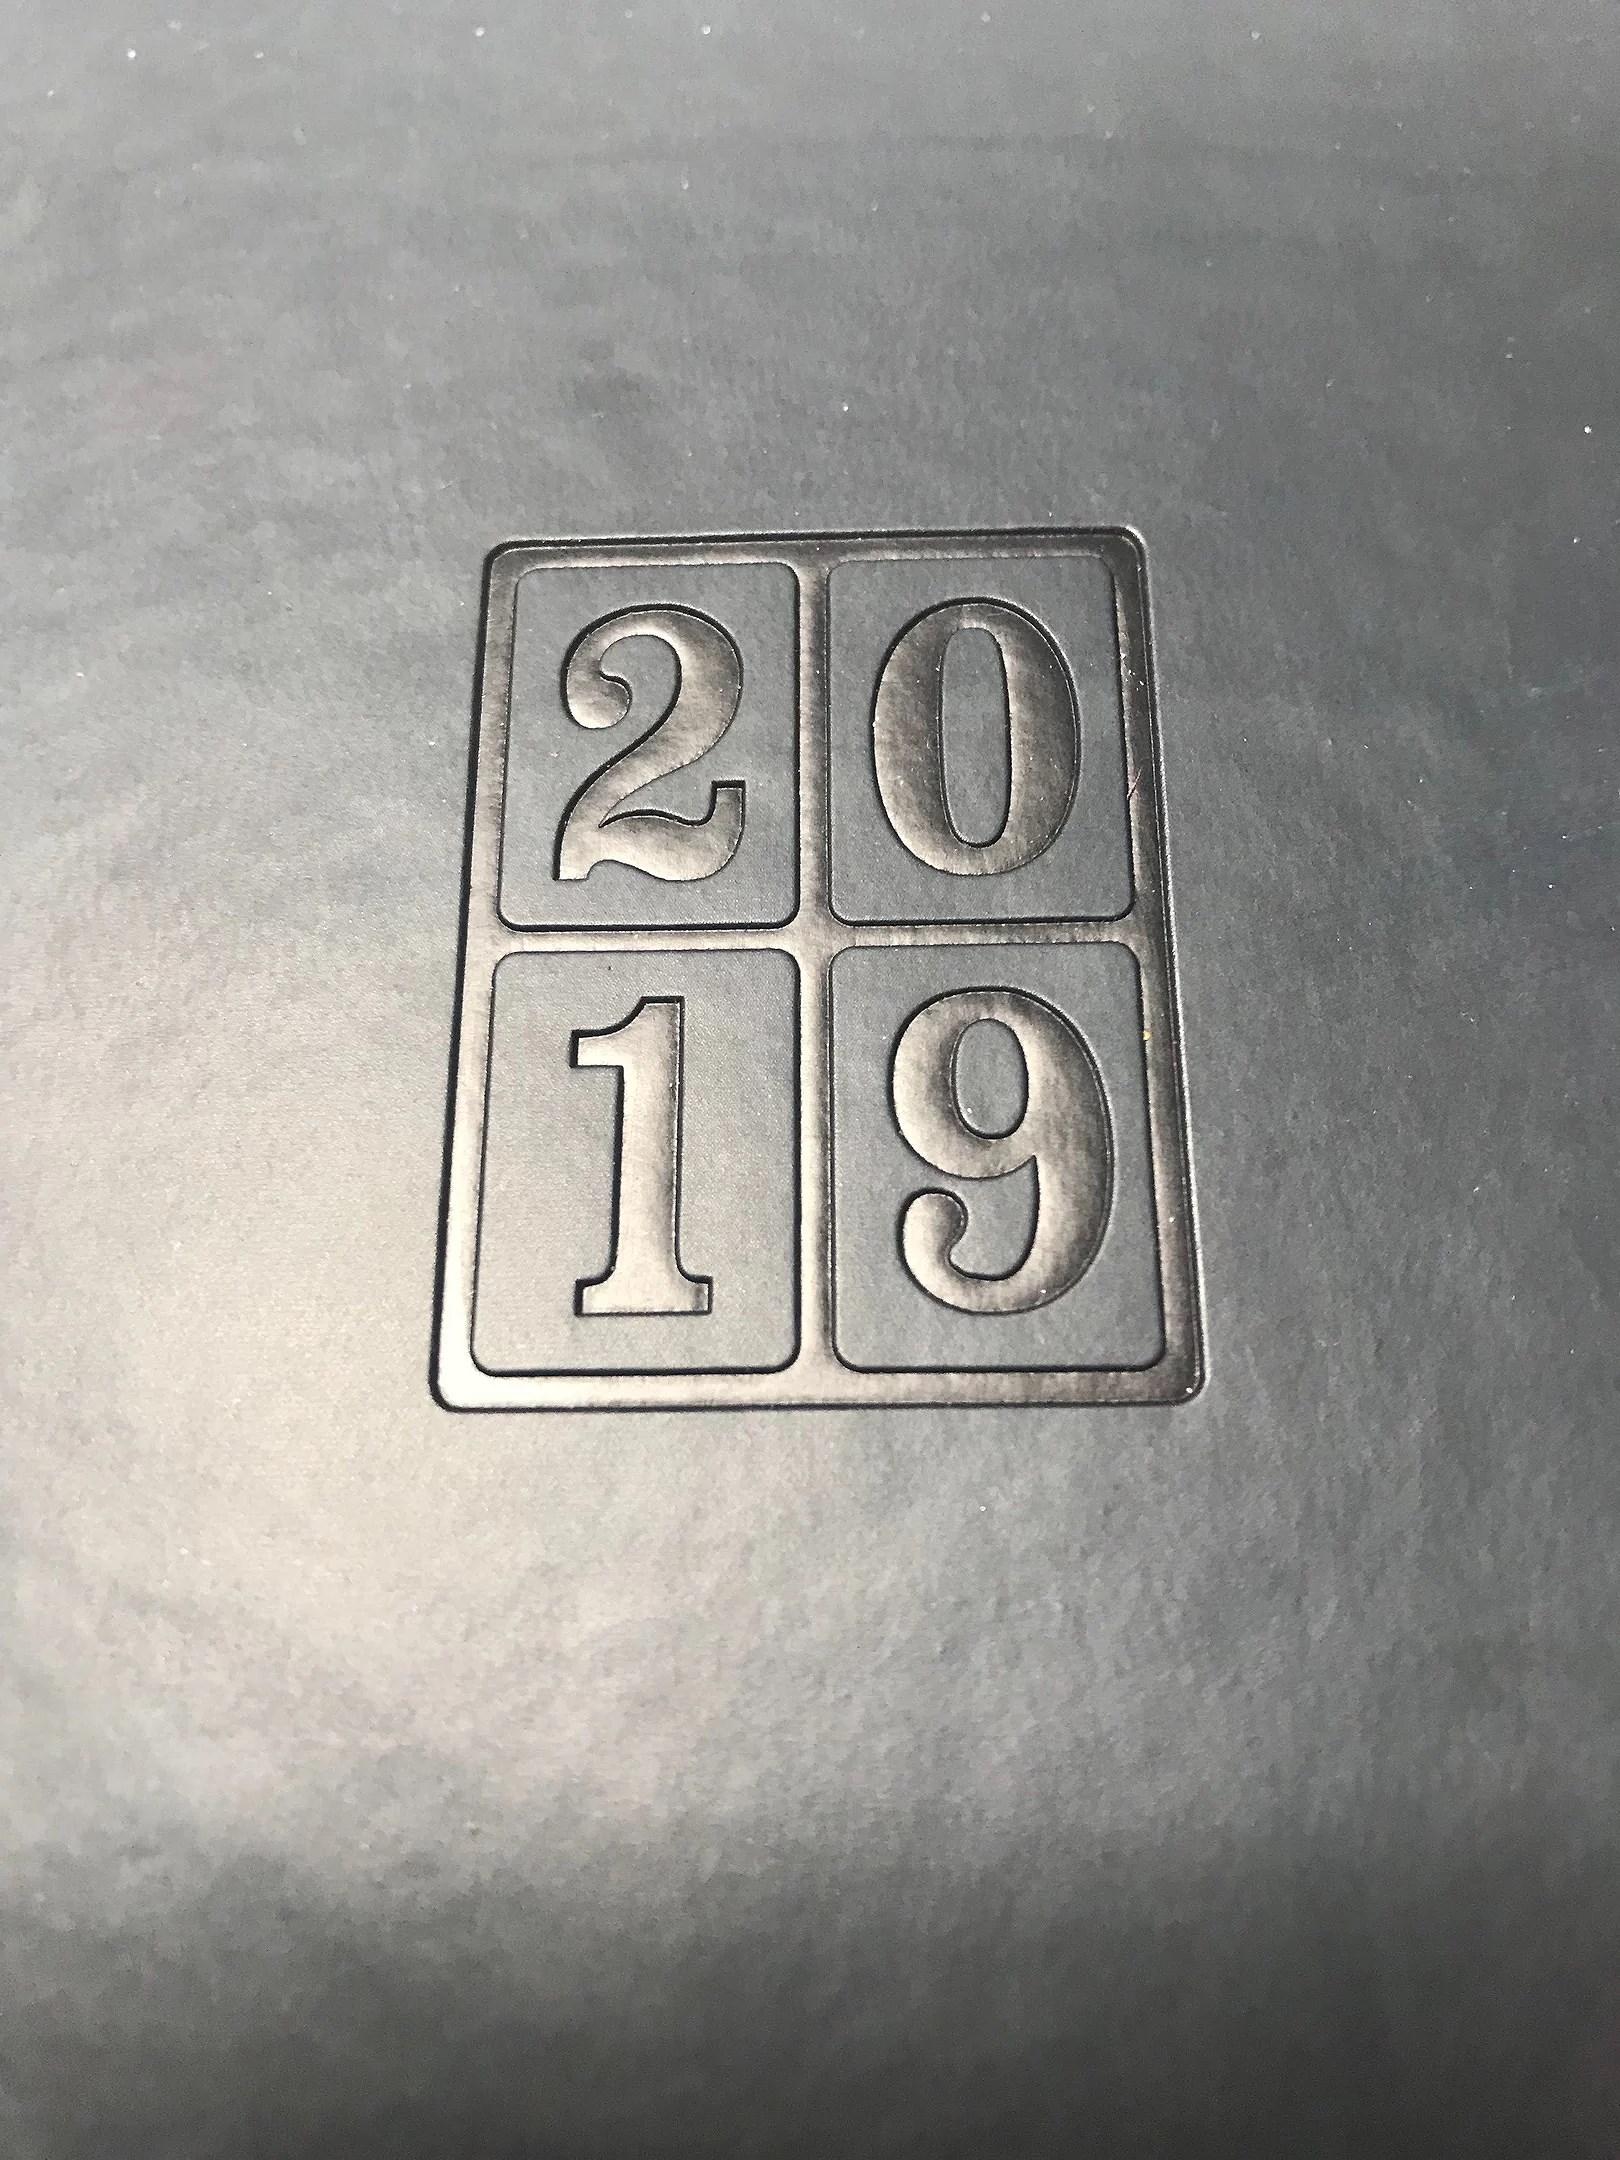 Vårt nya år börjar idag